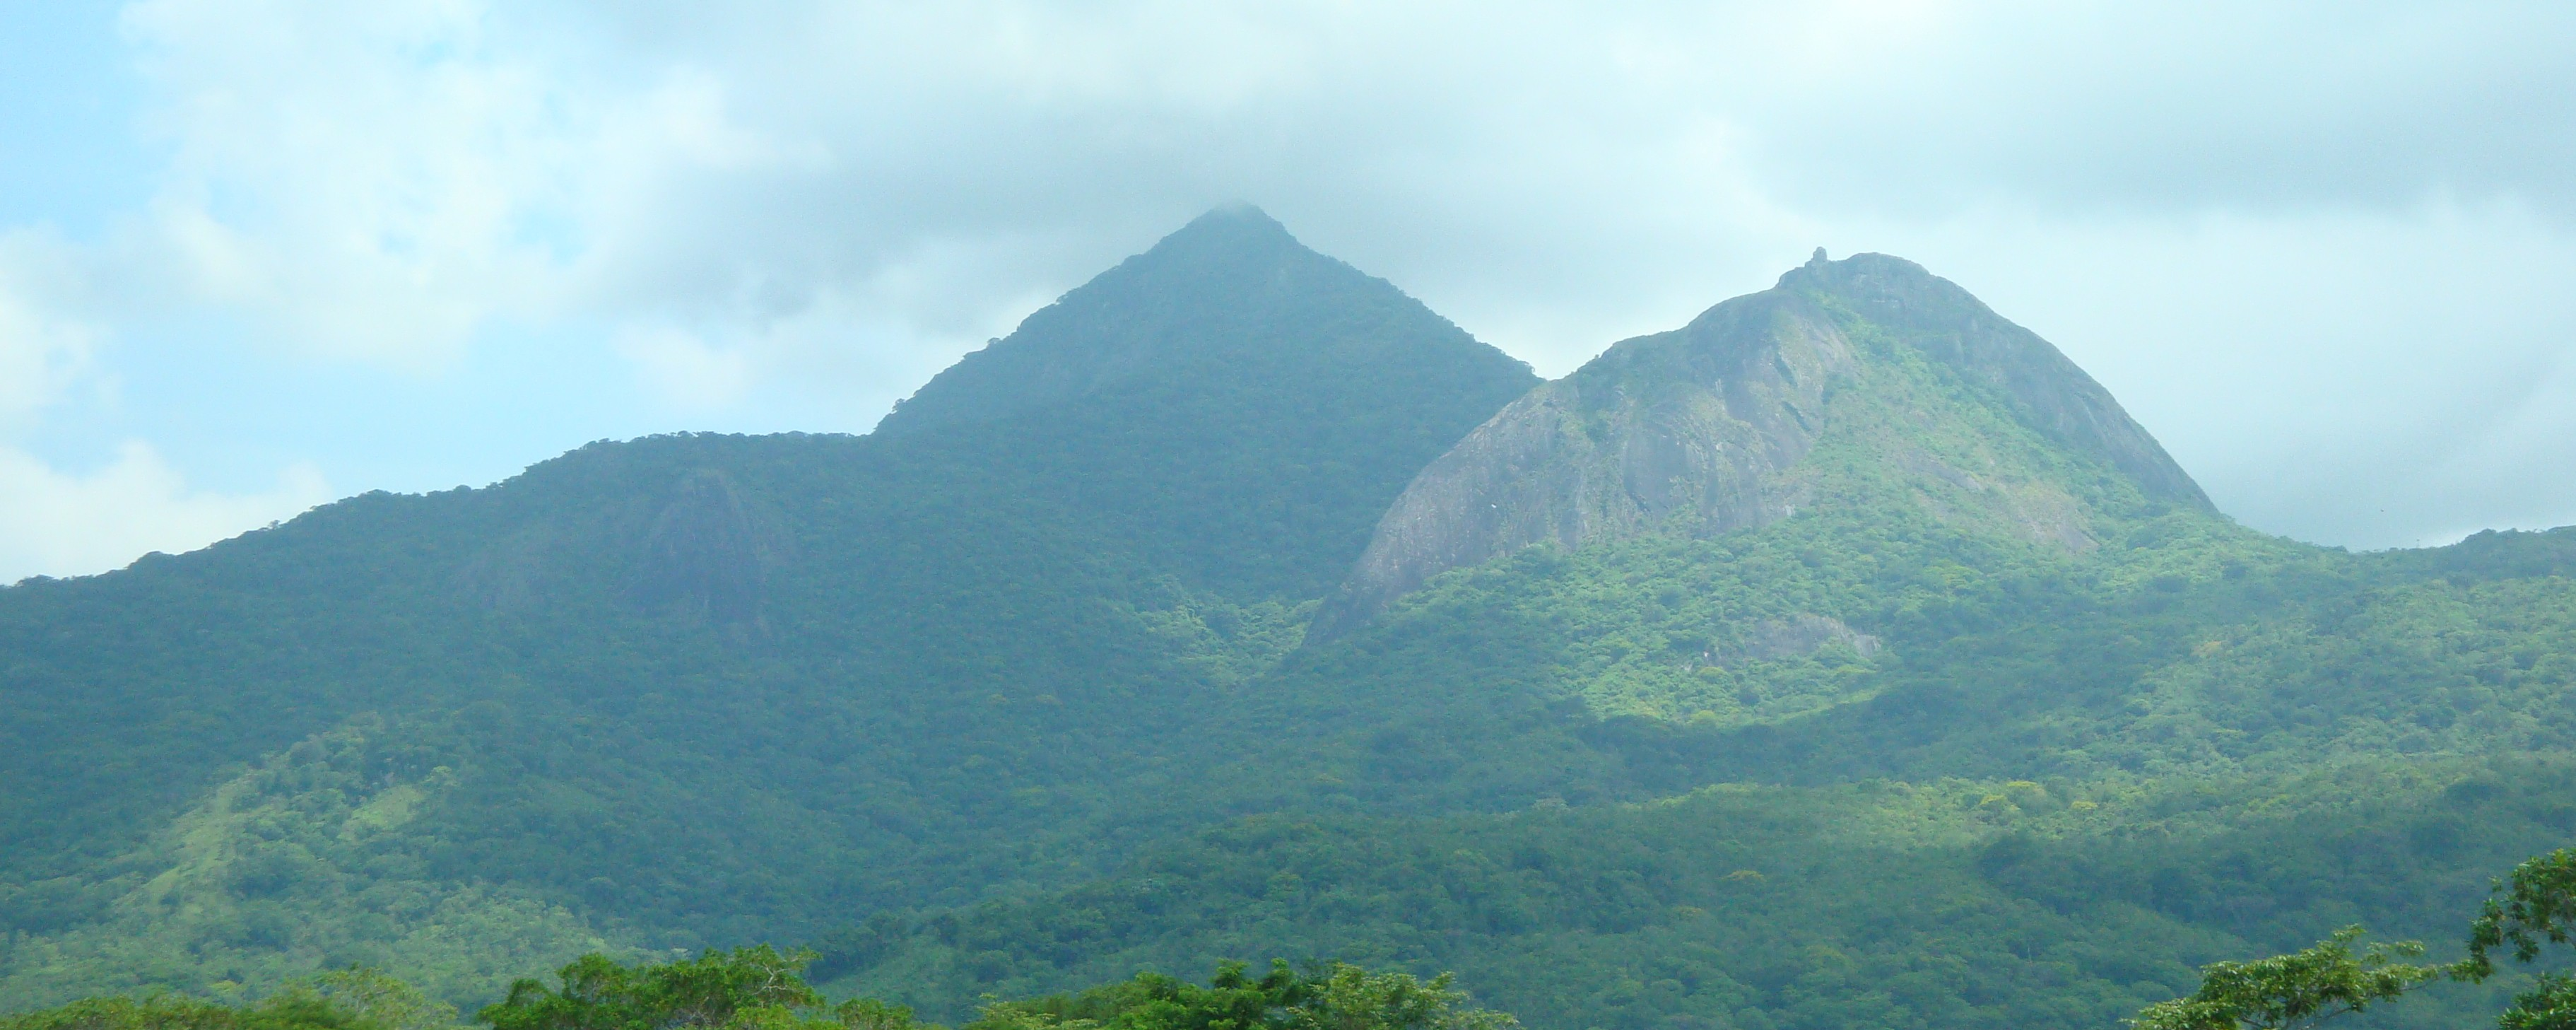 Depiction of Cerro de Bernal